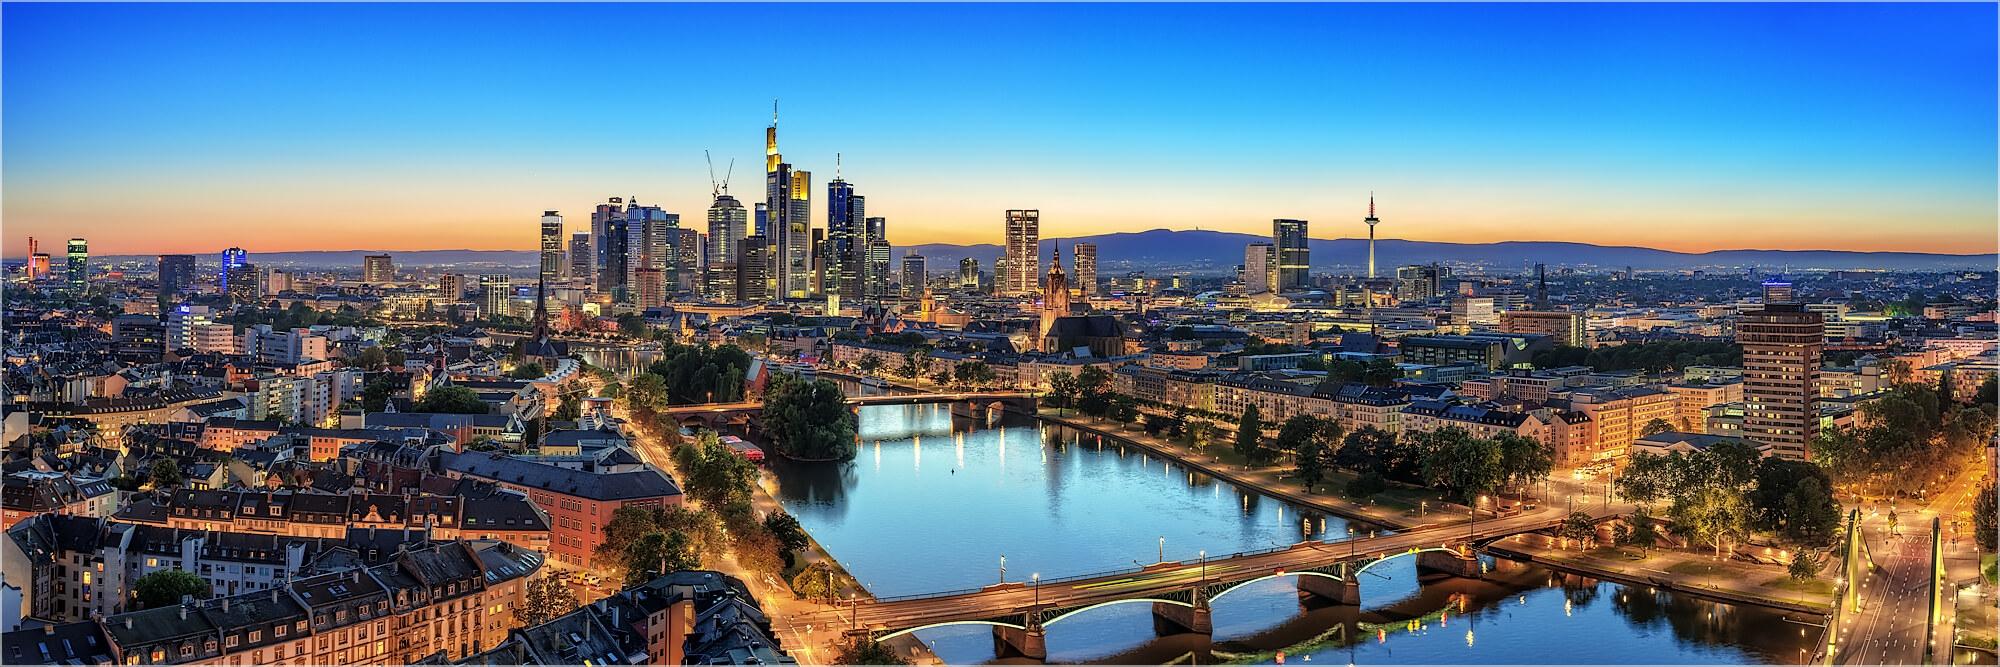 Panoramabild Frankfurt/Main Mainbrücken und Skyline